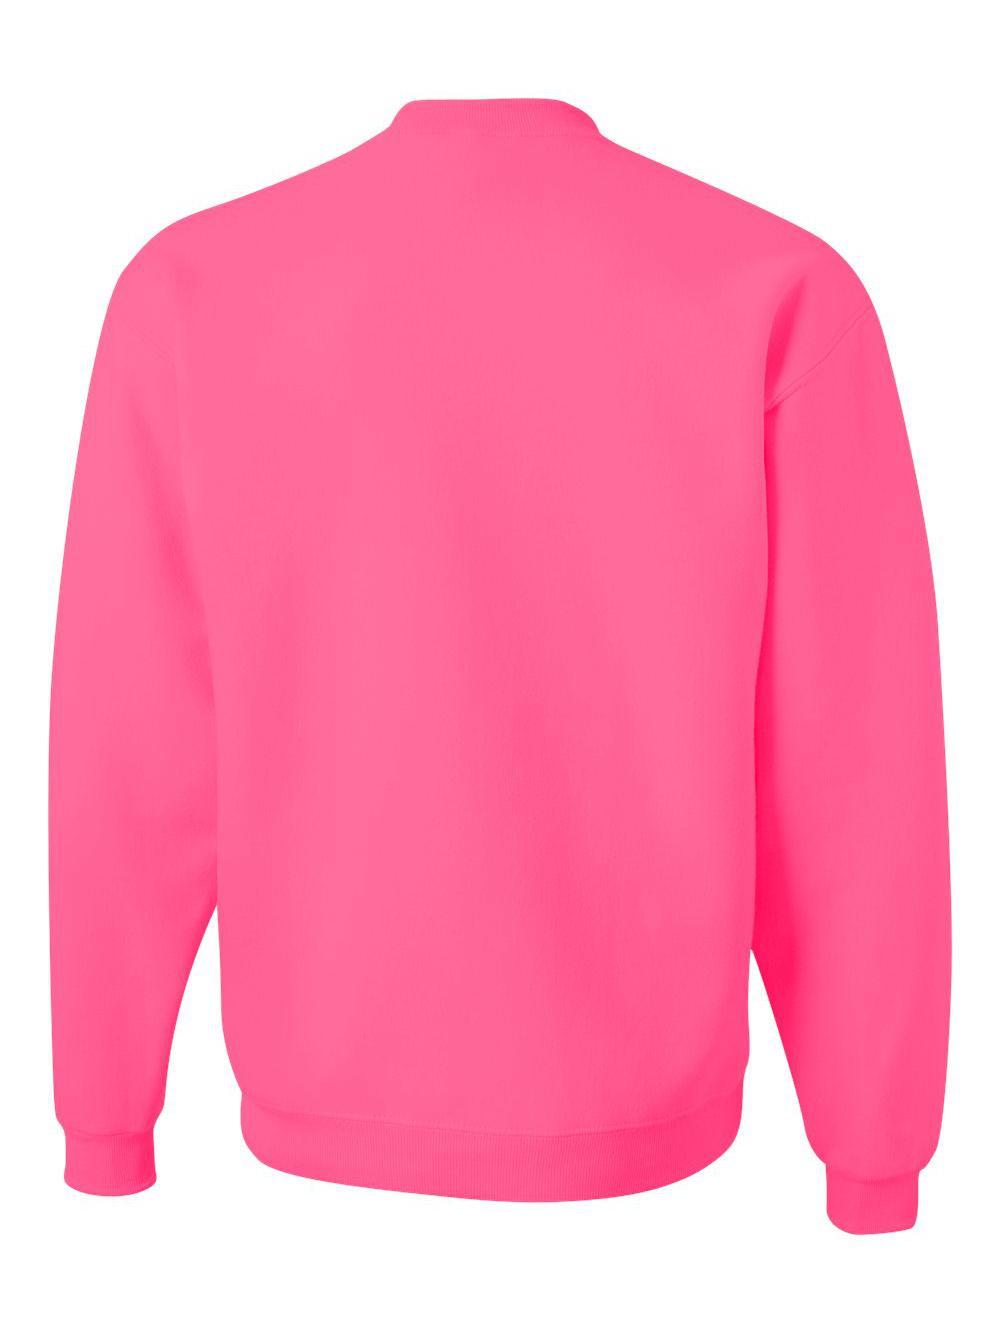 Jerzees-NuBlend-Crewneck-Sweatshirt-562MR thumbnail 64